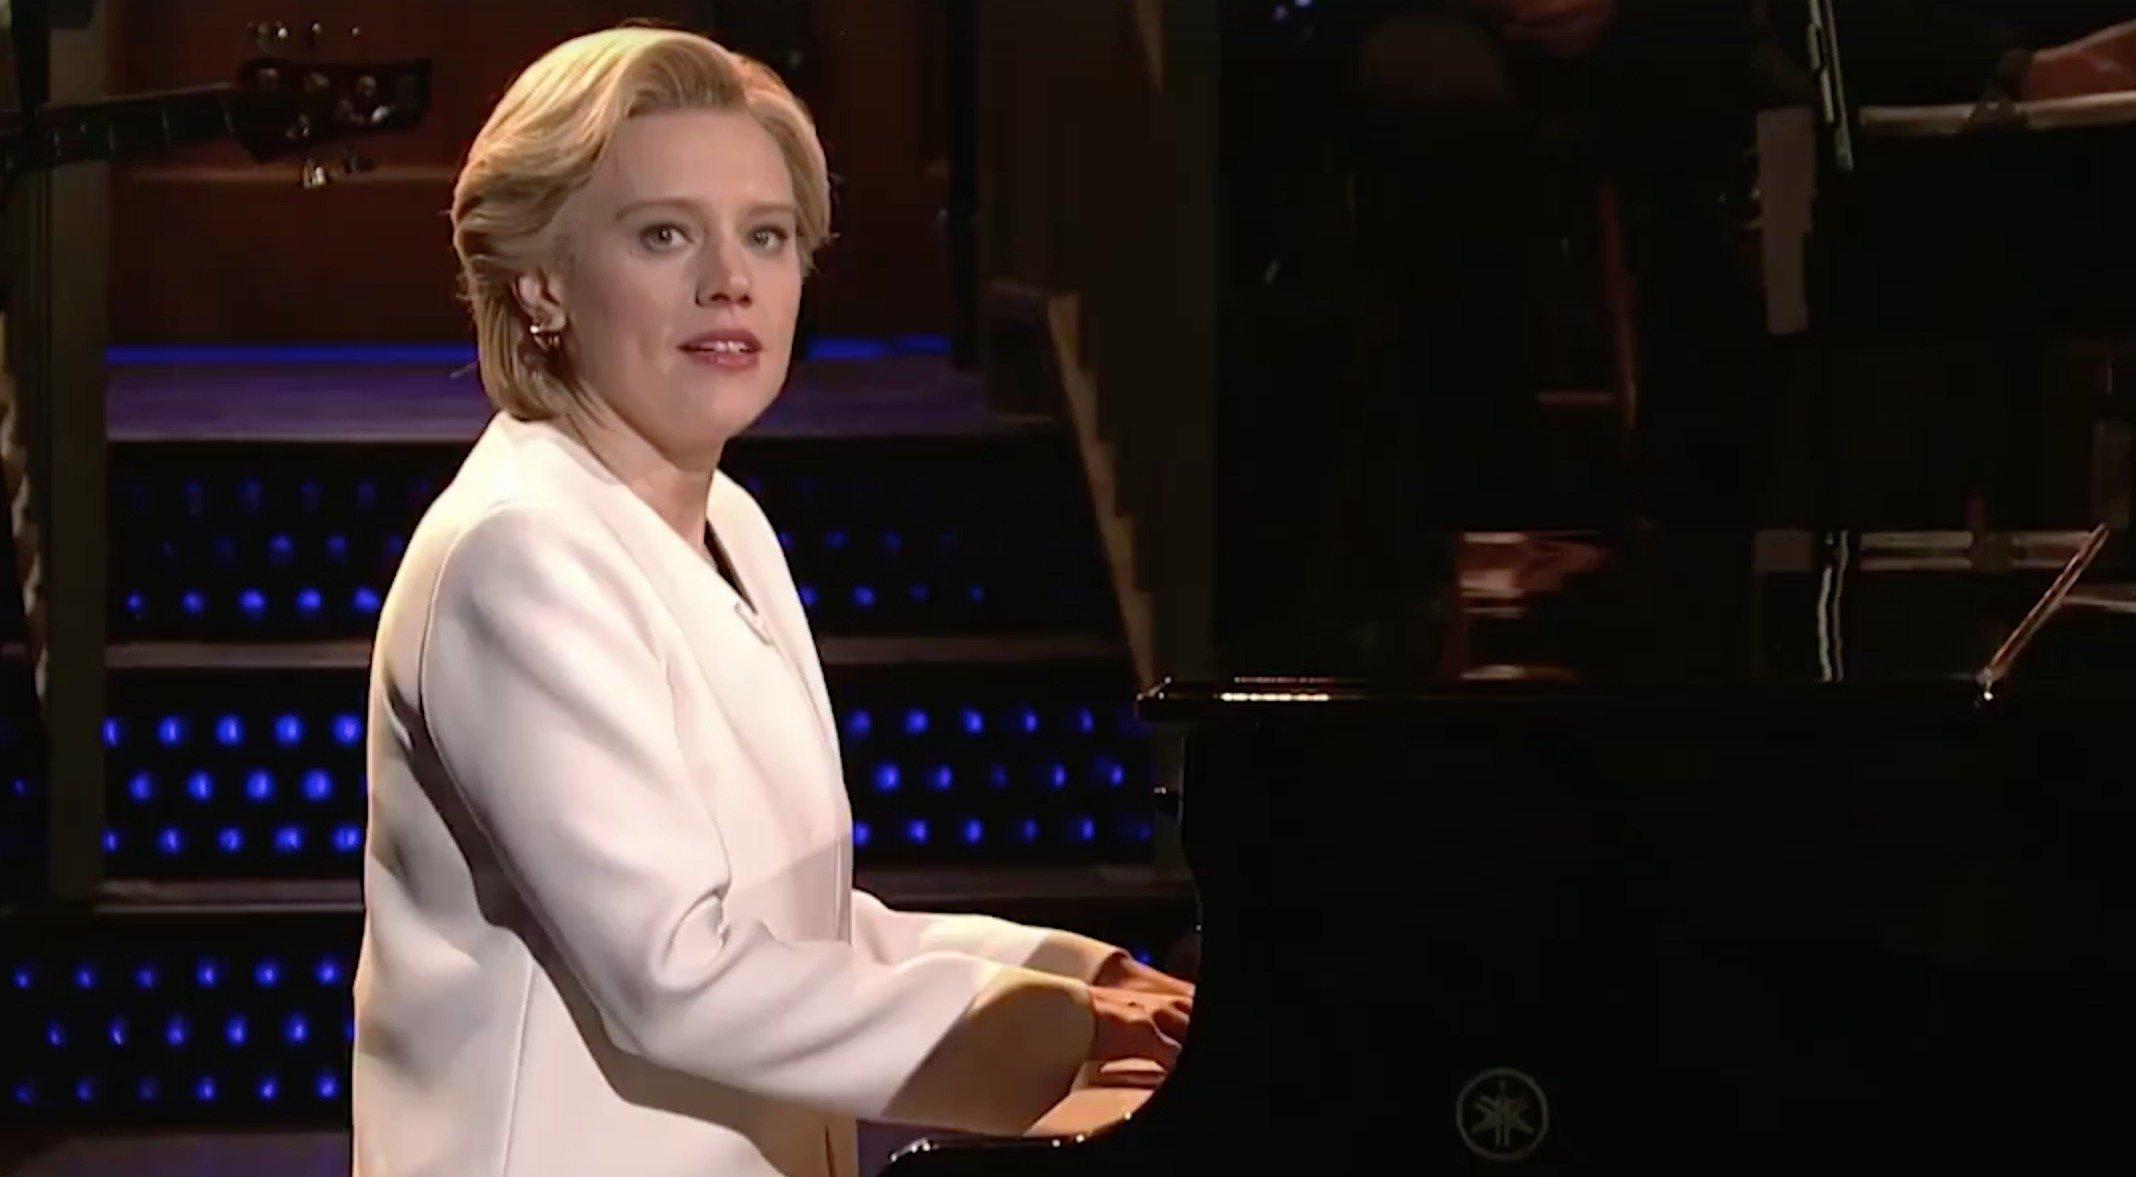 Kate McKinnon as Hillary Clinton on 'Saturday Night Live,' Nov. 12, 2016